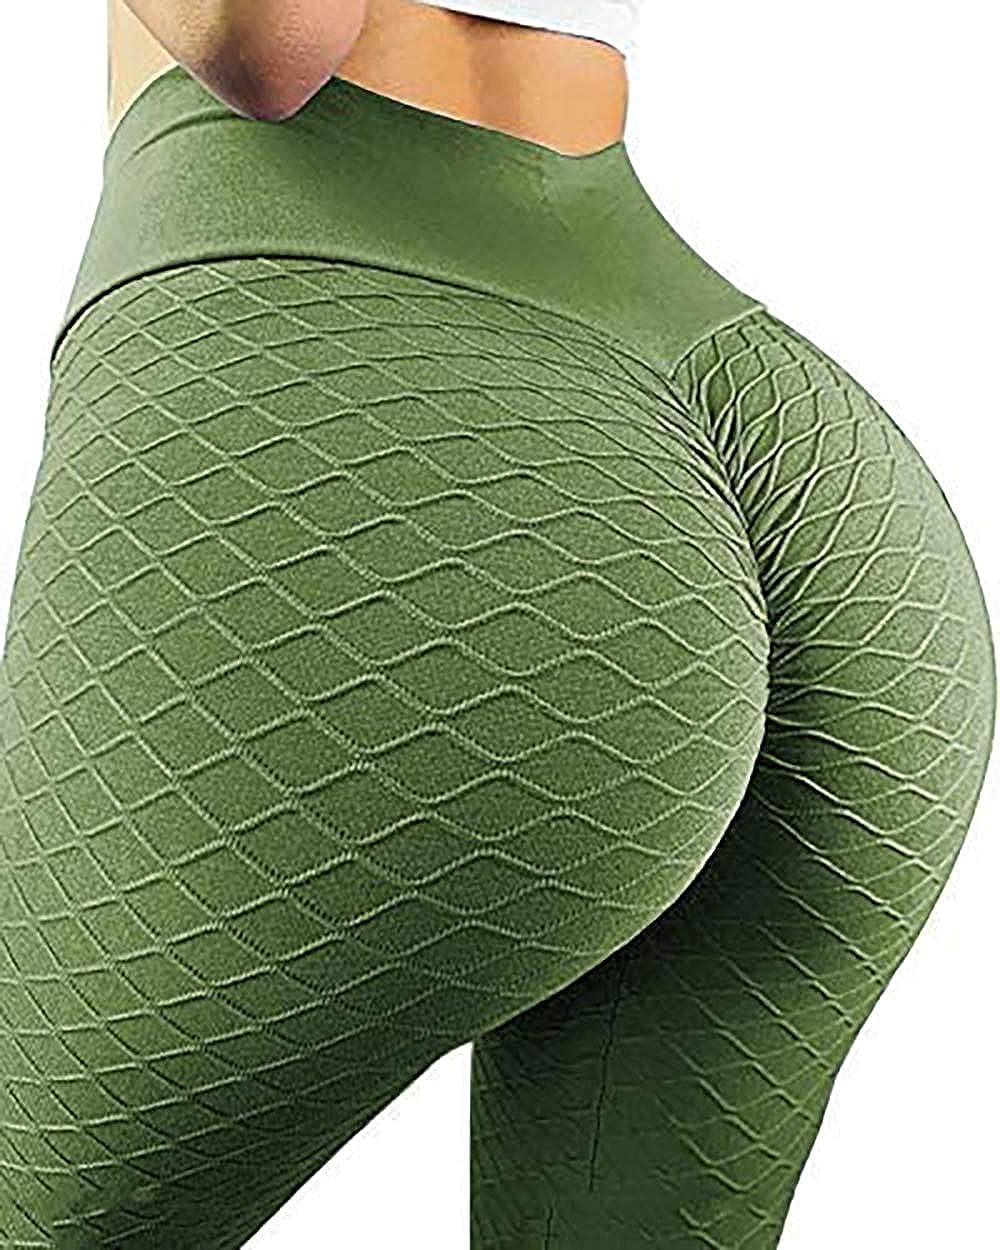 Womens Yoga Pants High Waist Yoga Leggings Workout Running Pants Butt Lift Tights Tummy Control Leggings